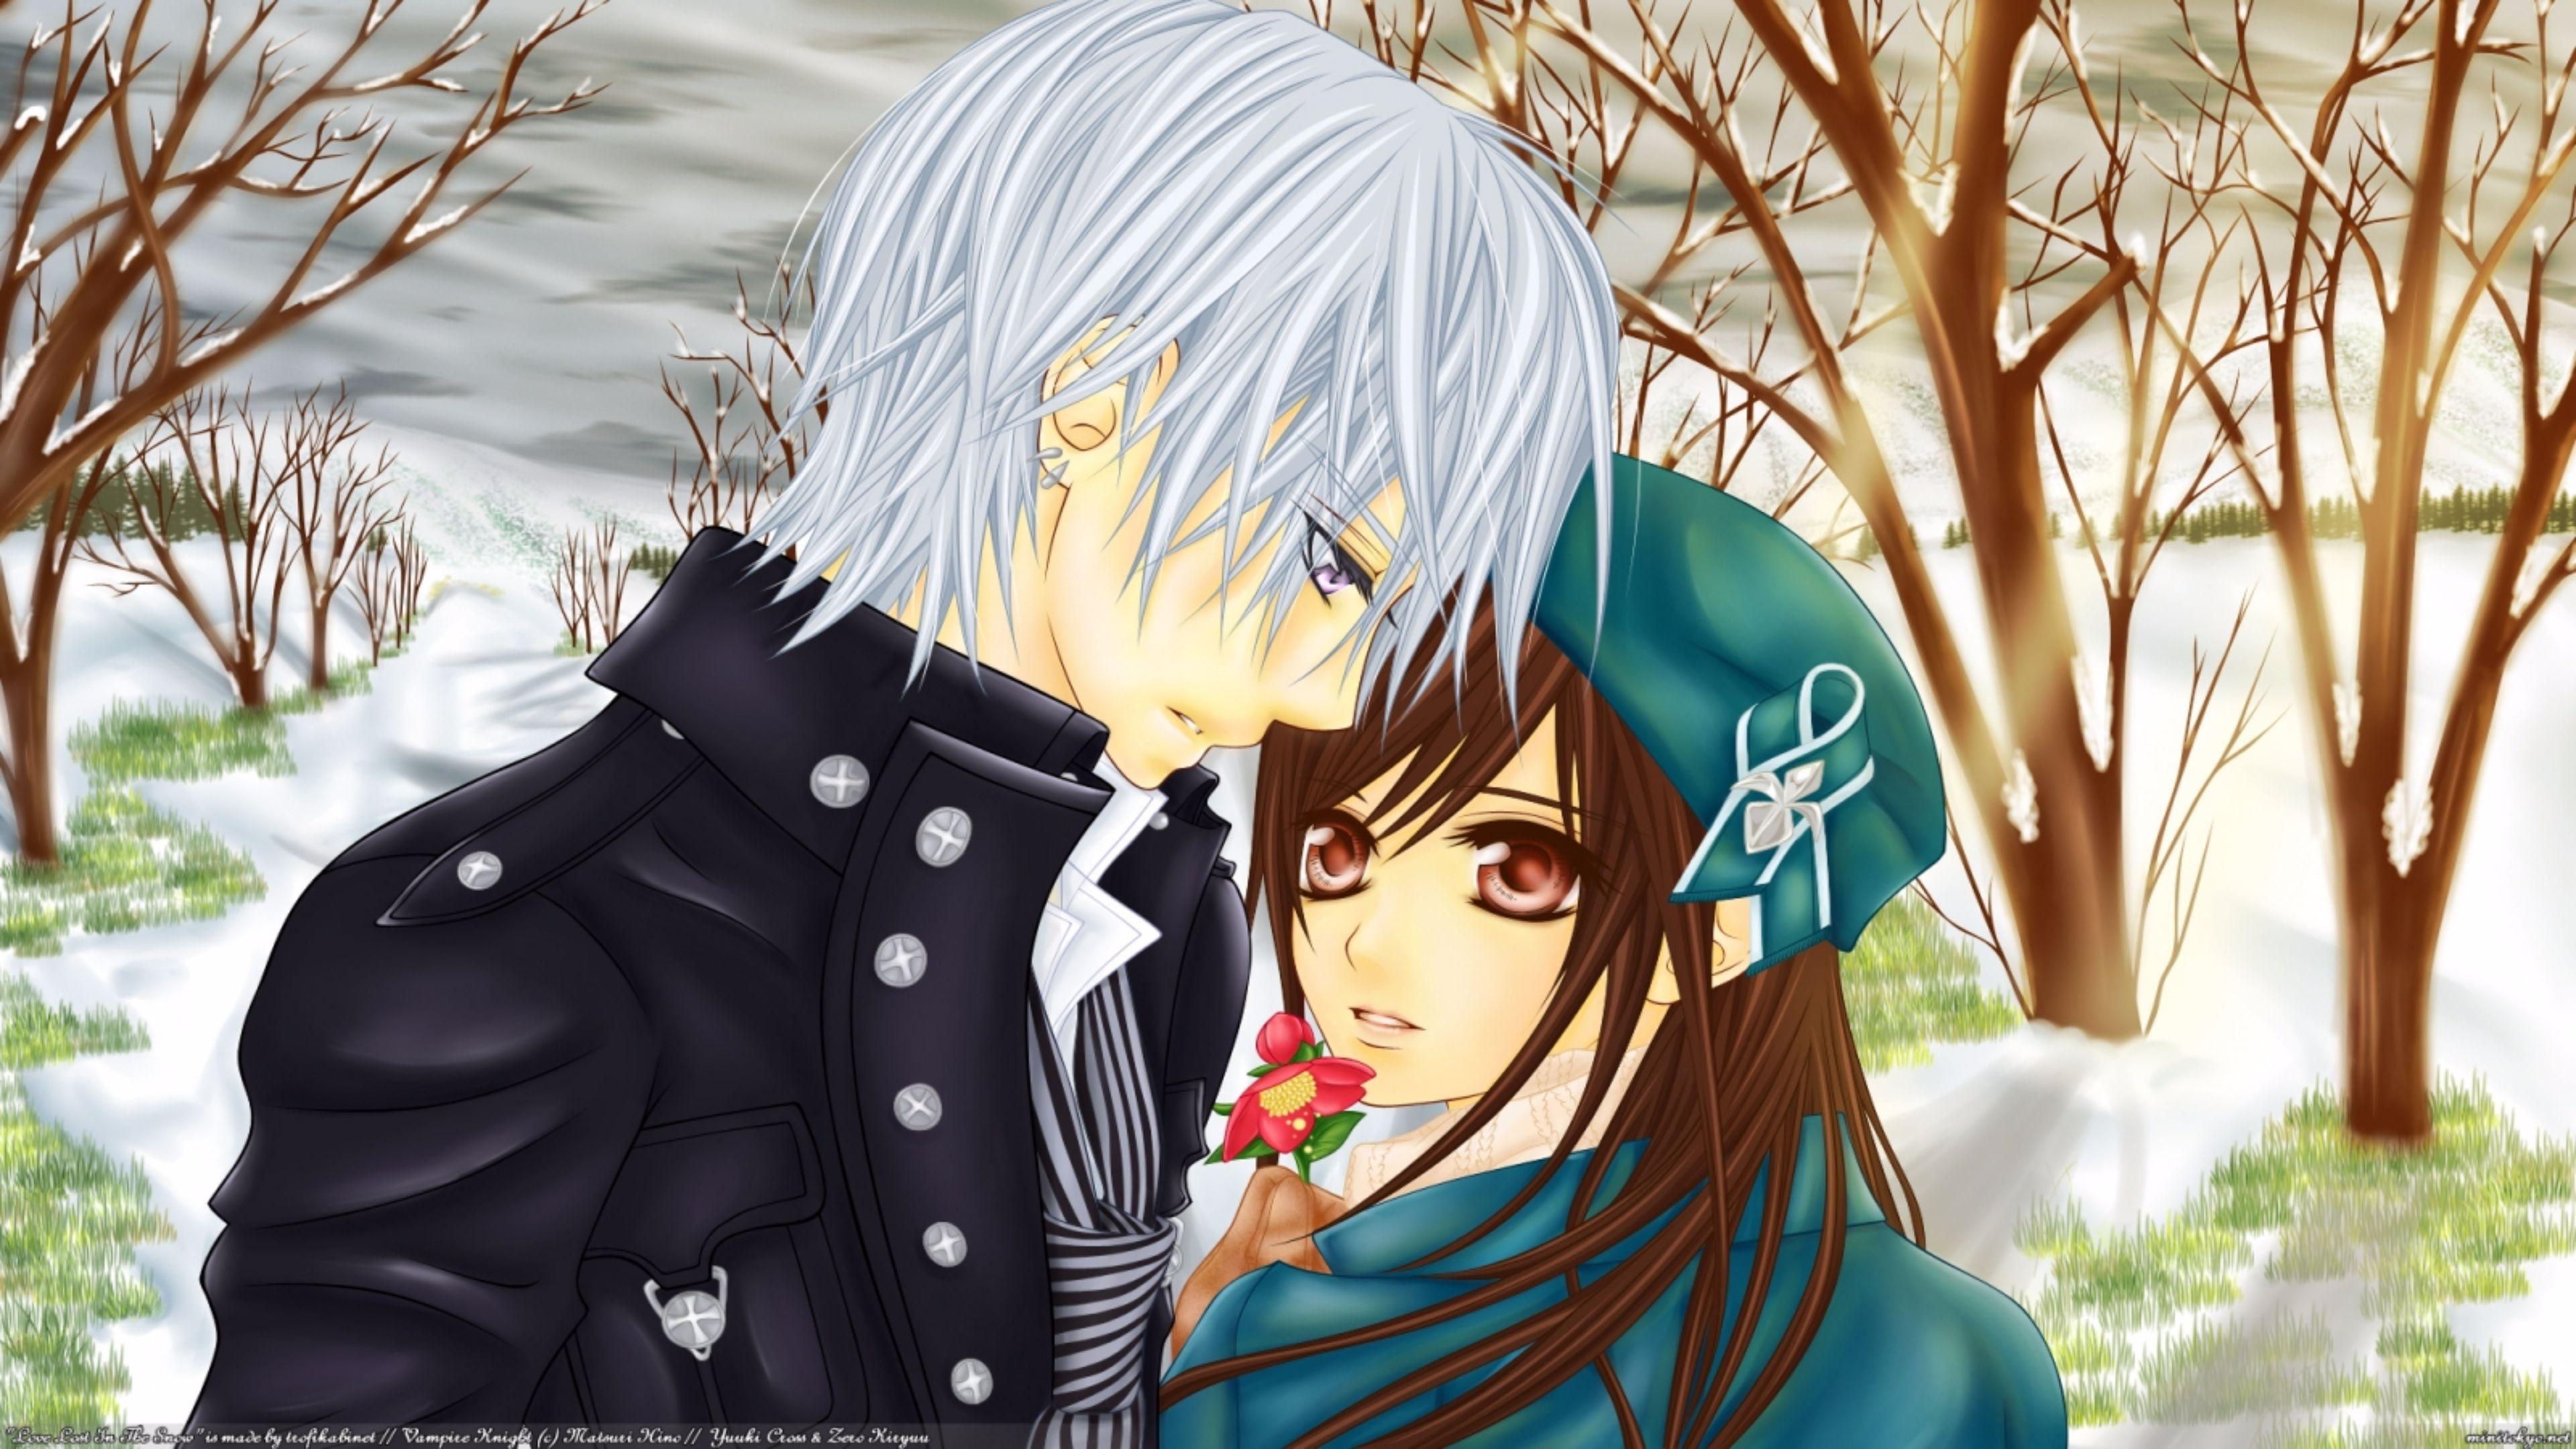 76] Romantic Anime Wallpapers on WallpaperSafari 3840x2160